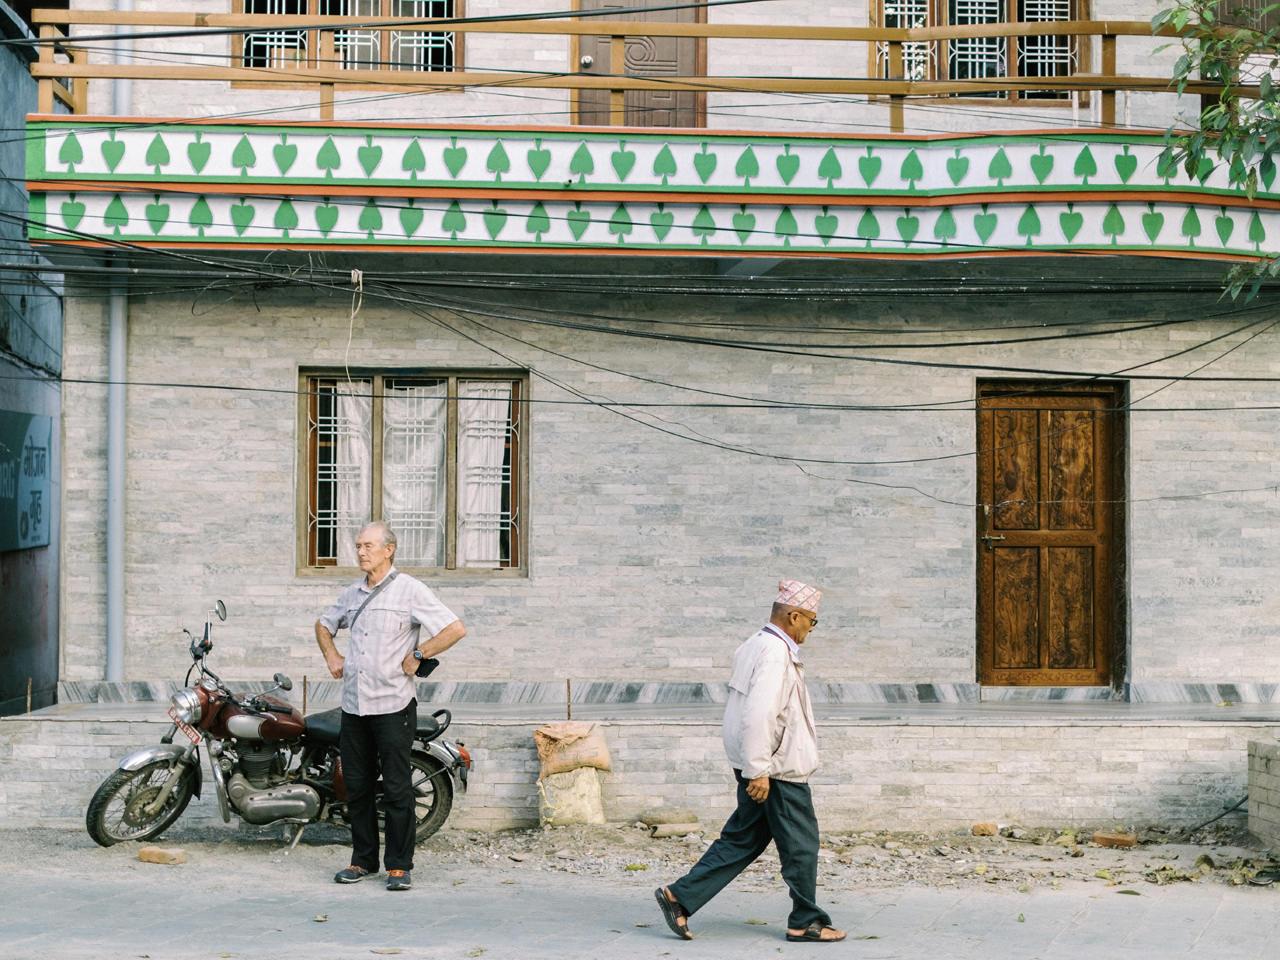 Nepal 2019 - Trekking Annapurna Base Camp 35